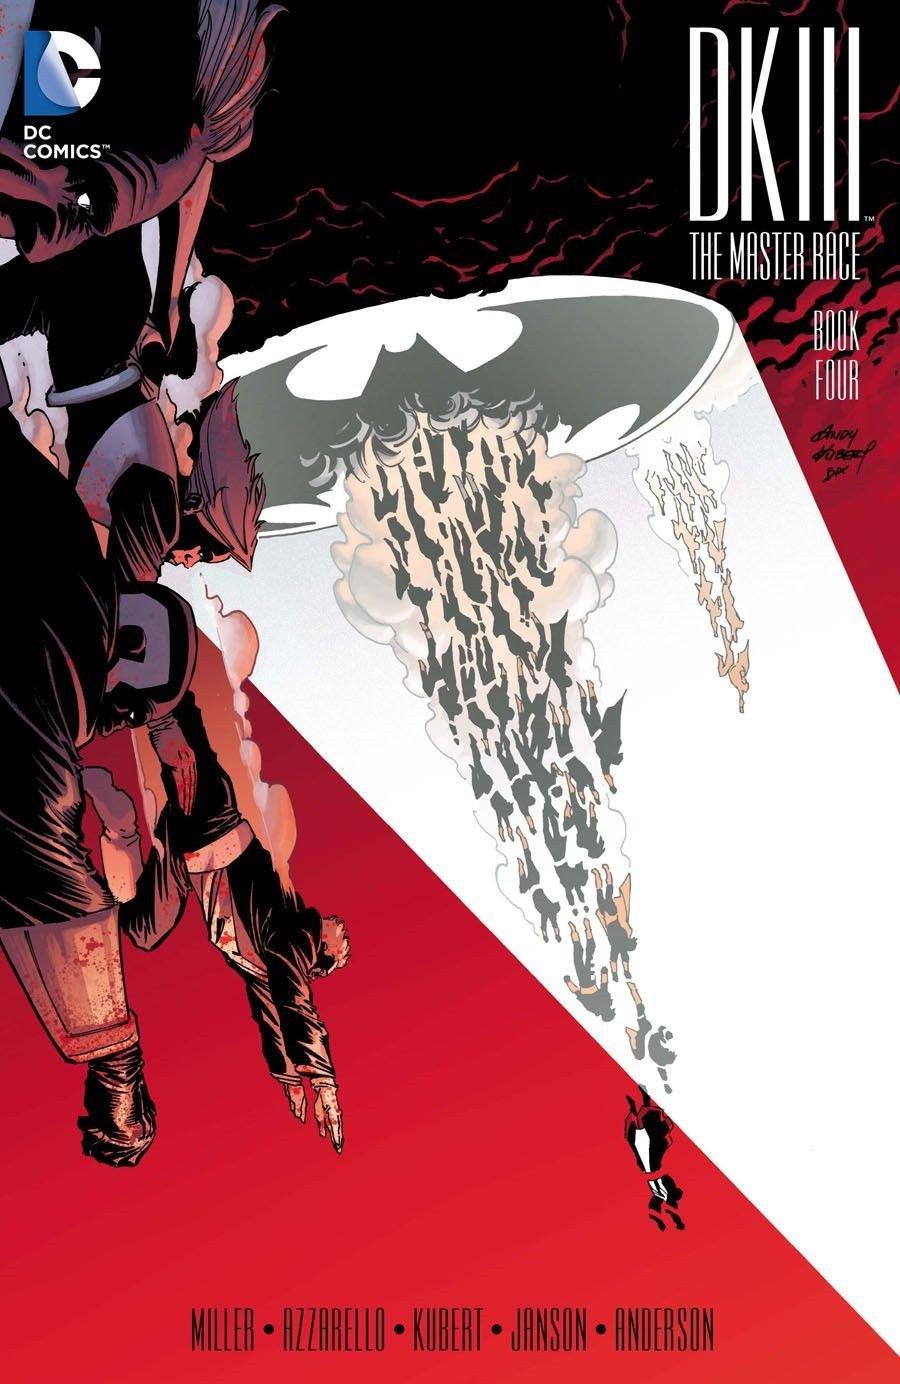 Dark Knight III: The Master Race #4 [2016] VF/NM DC Comics